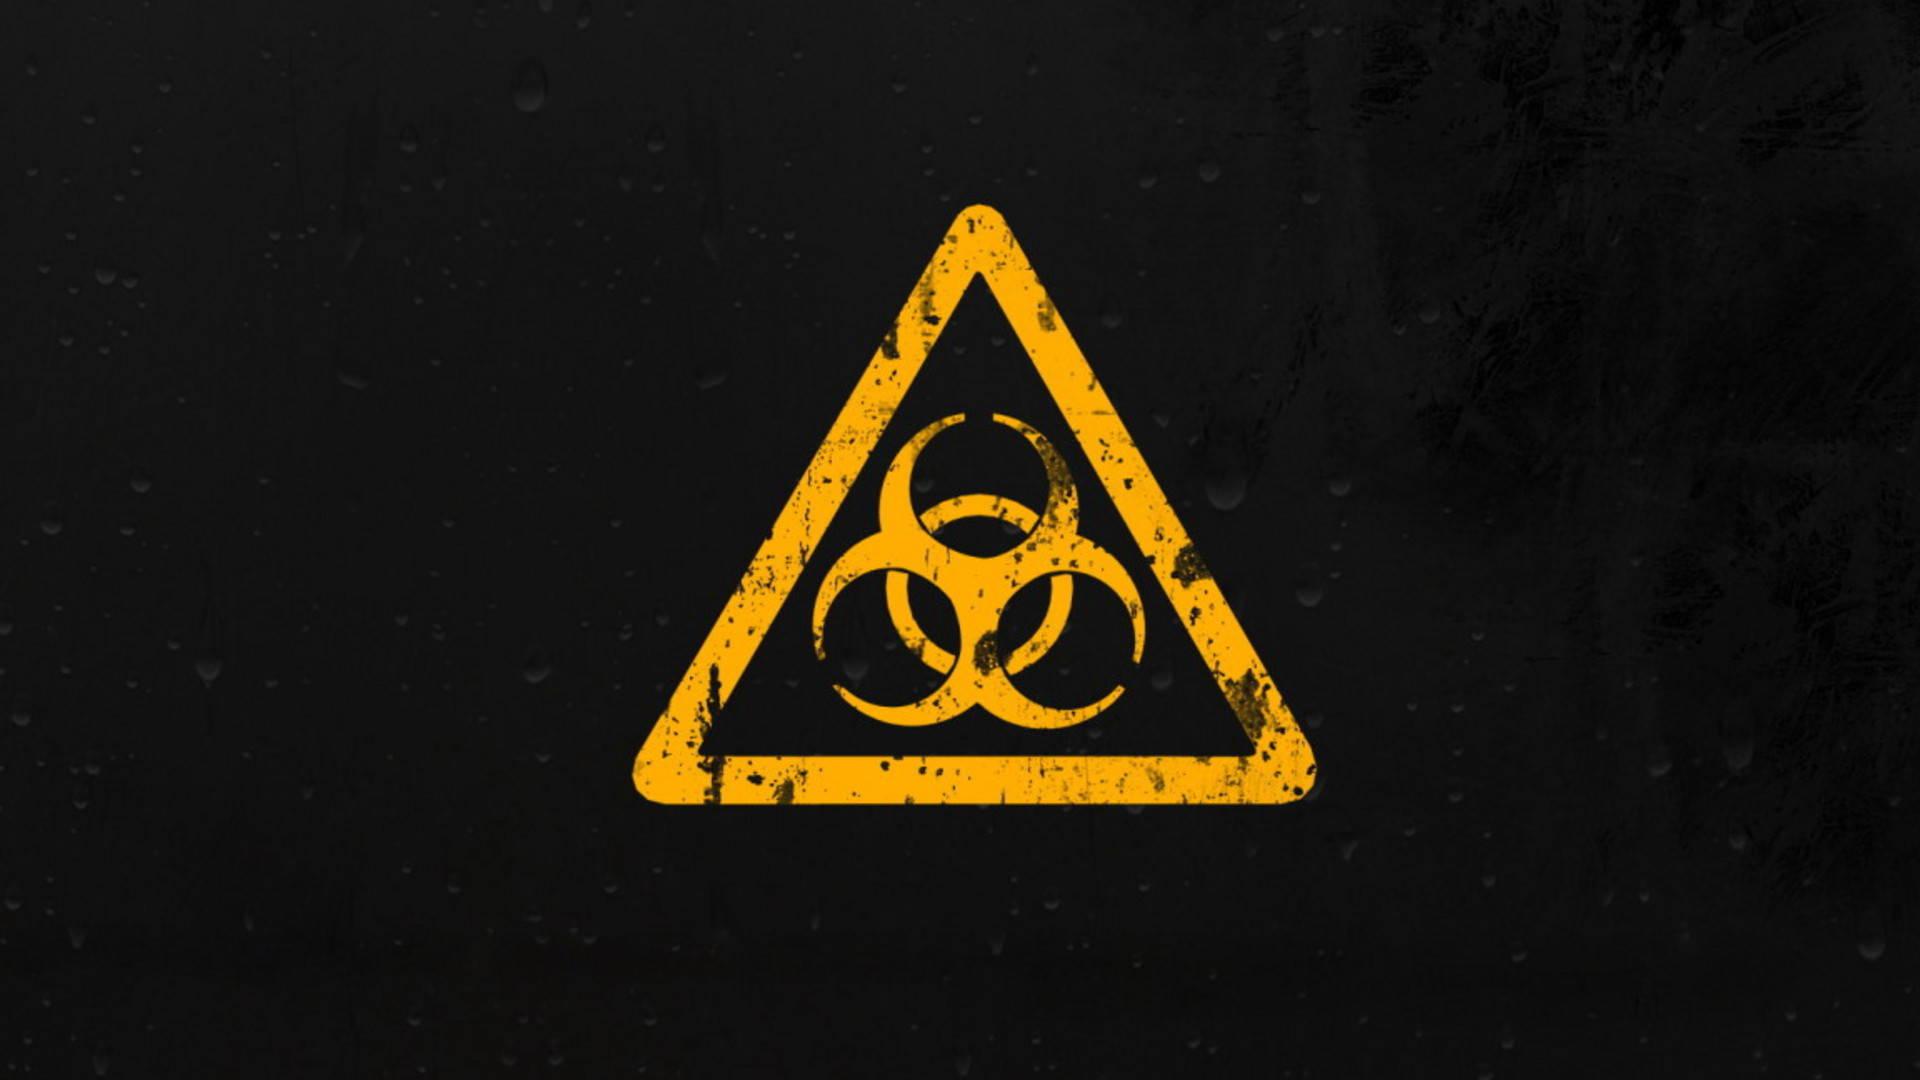 Biohazard 19202151080 Wallpaper 930299 1920x1080